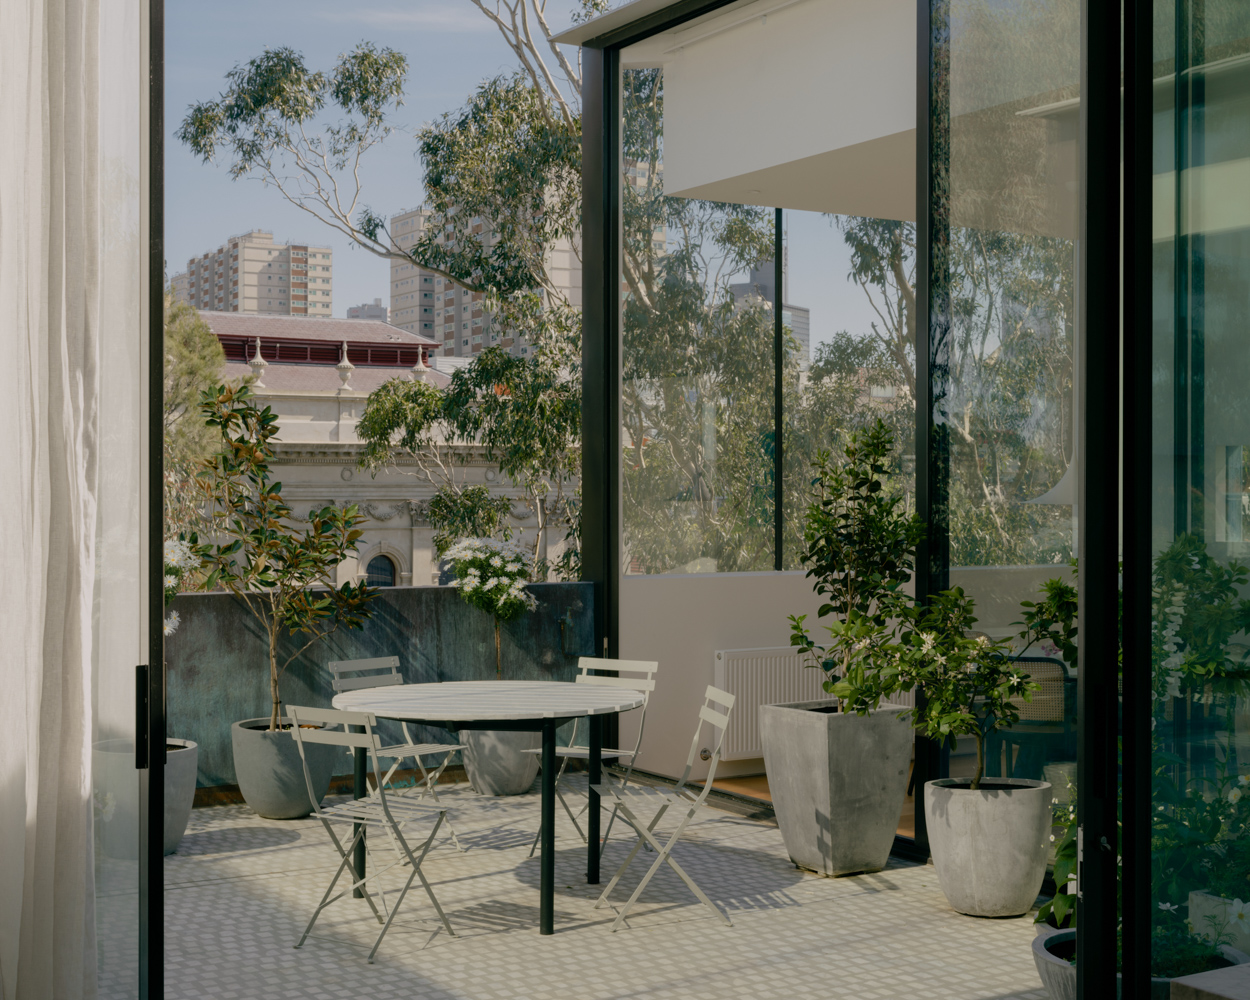 Apartment courtyard design